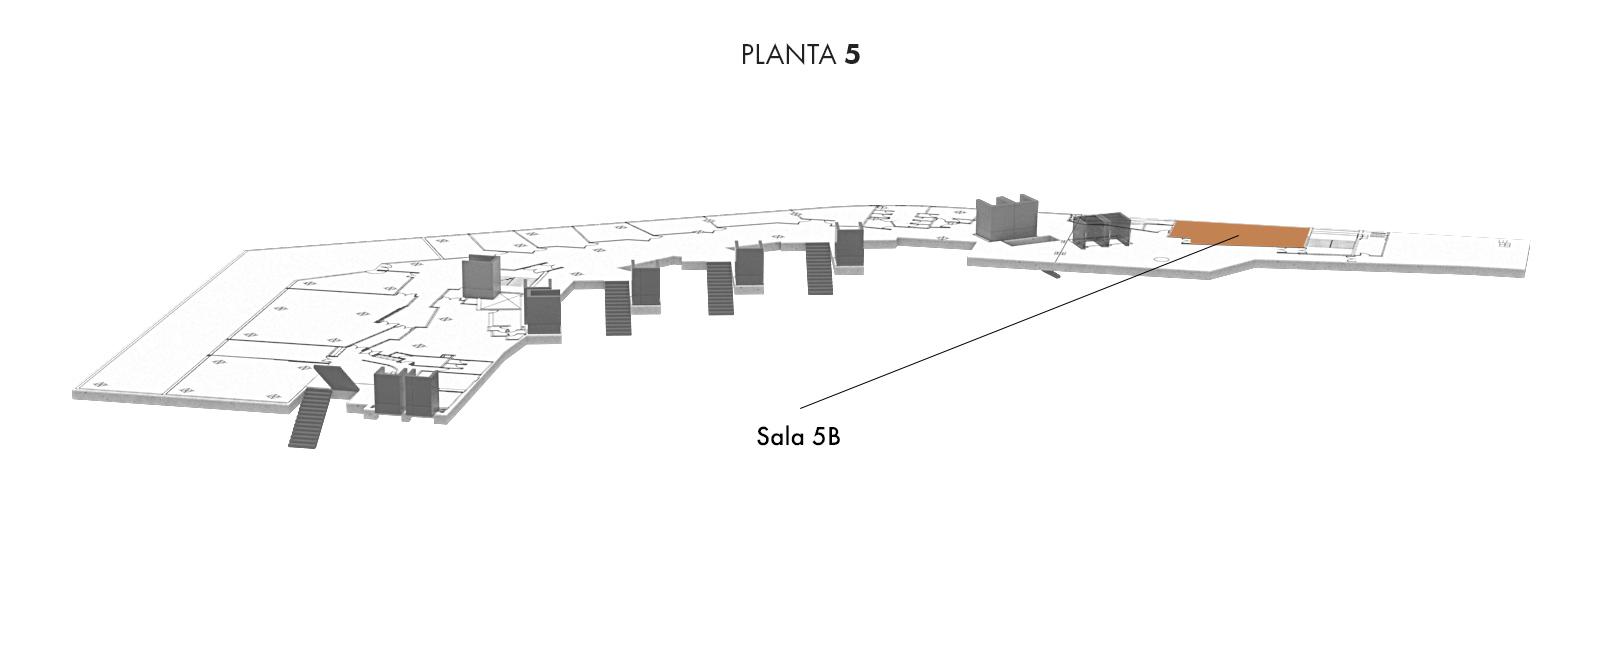 Sala 5B, Planta 5   Palacio Euskalduna Jauregia